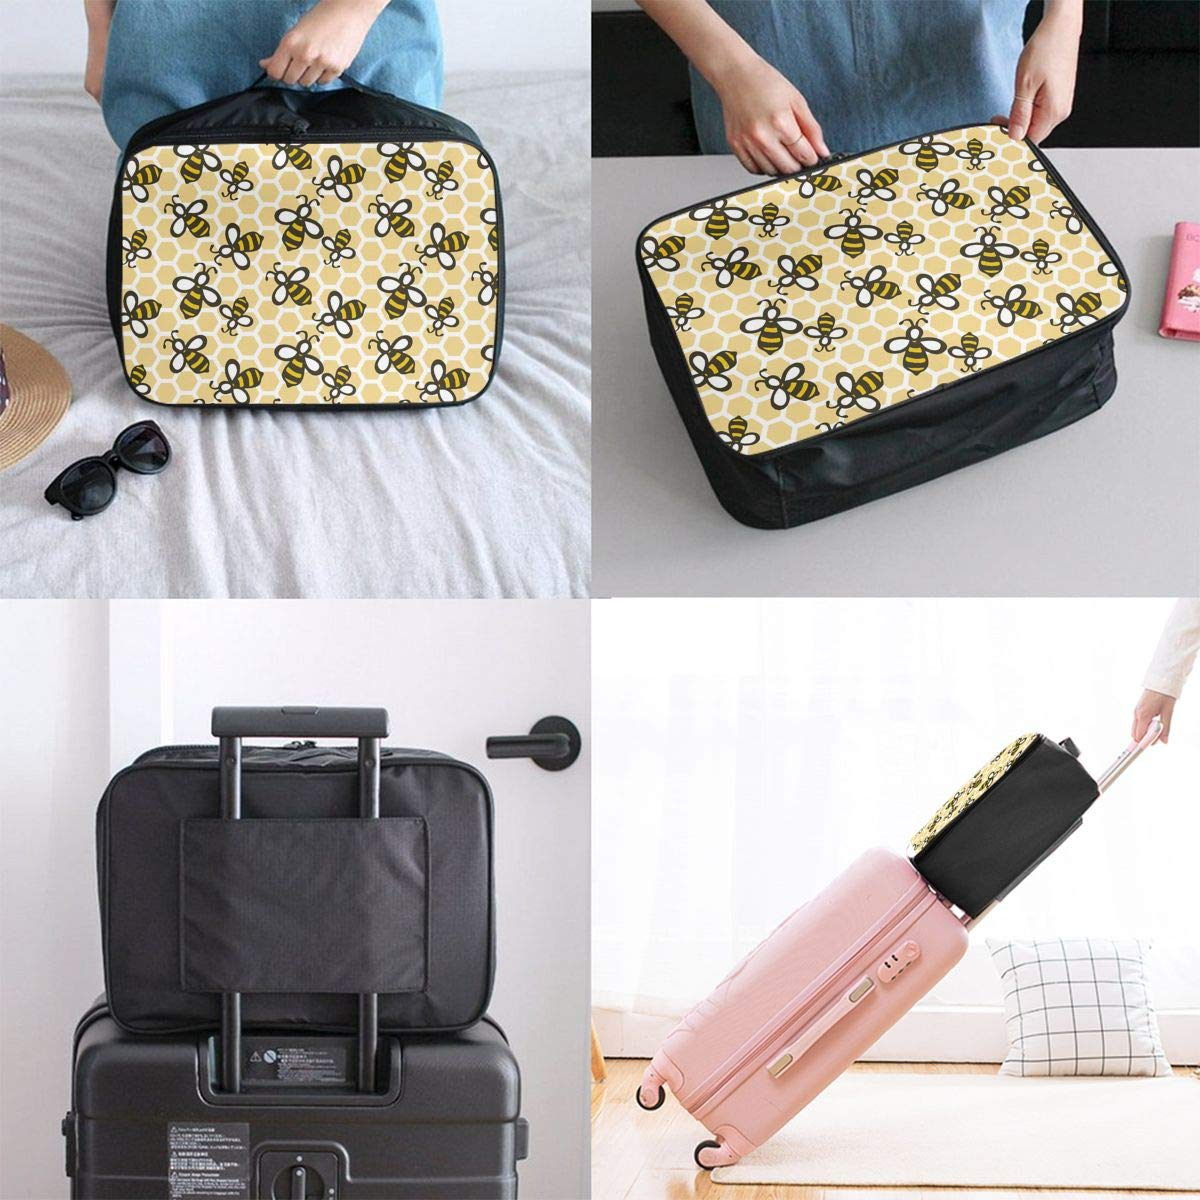 Travel Luggage Duffle Bag Lightweight Portable Handbag Honey Bees Pattern Large Capacity Waterproof Foldable Storage Tote